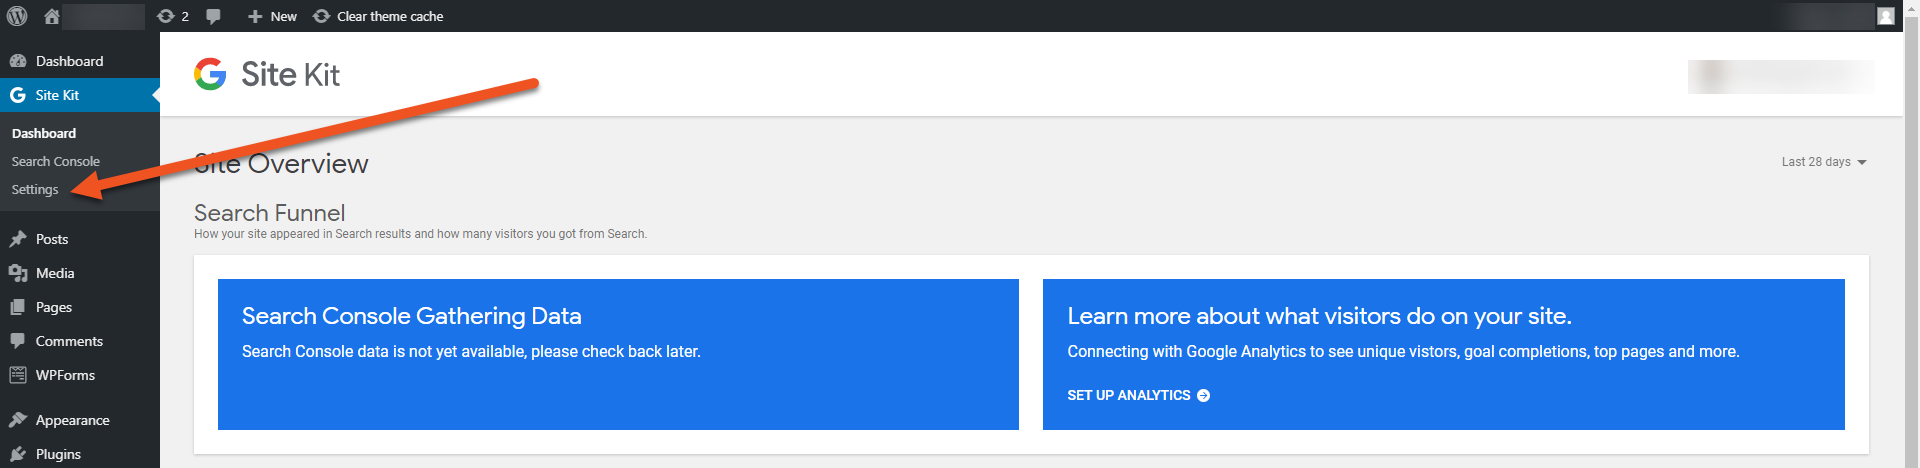 settings tab image